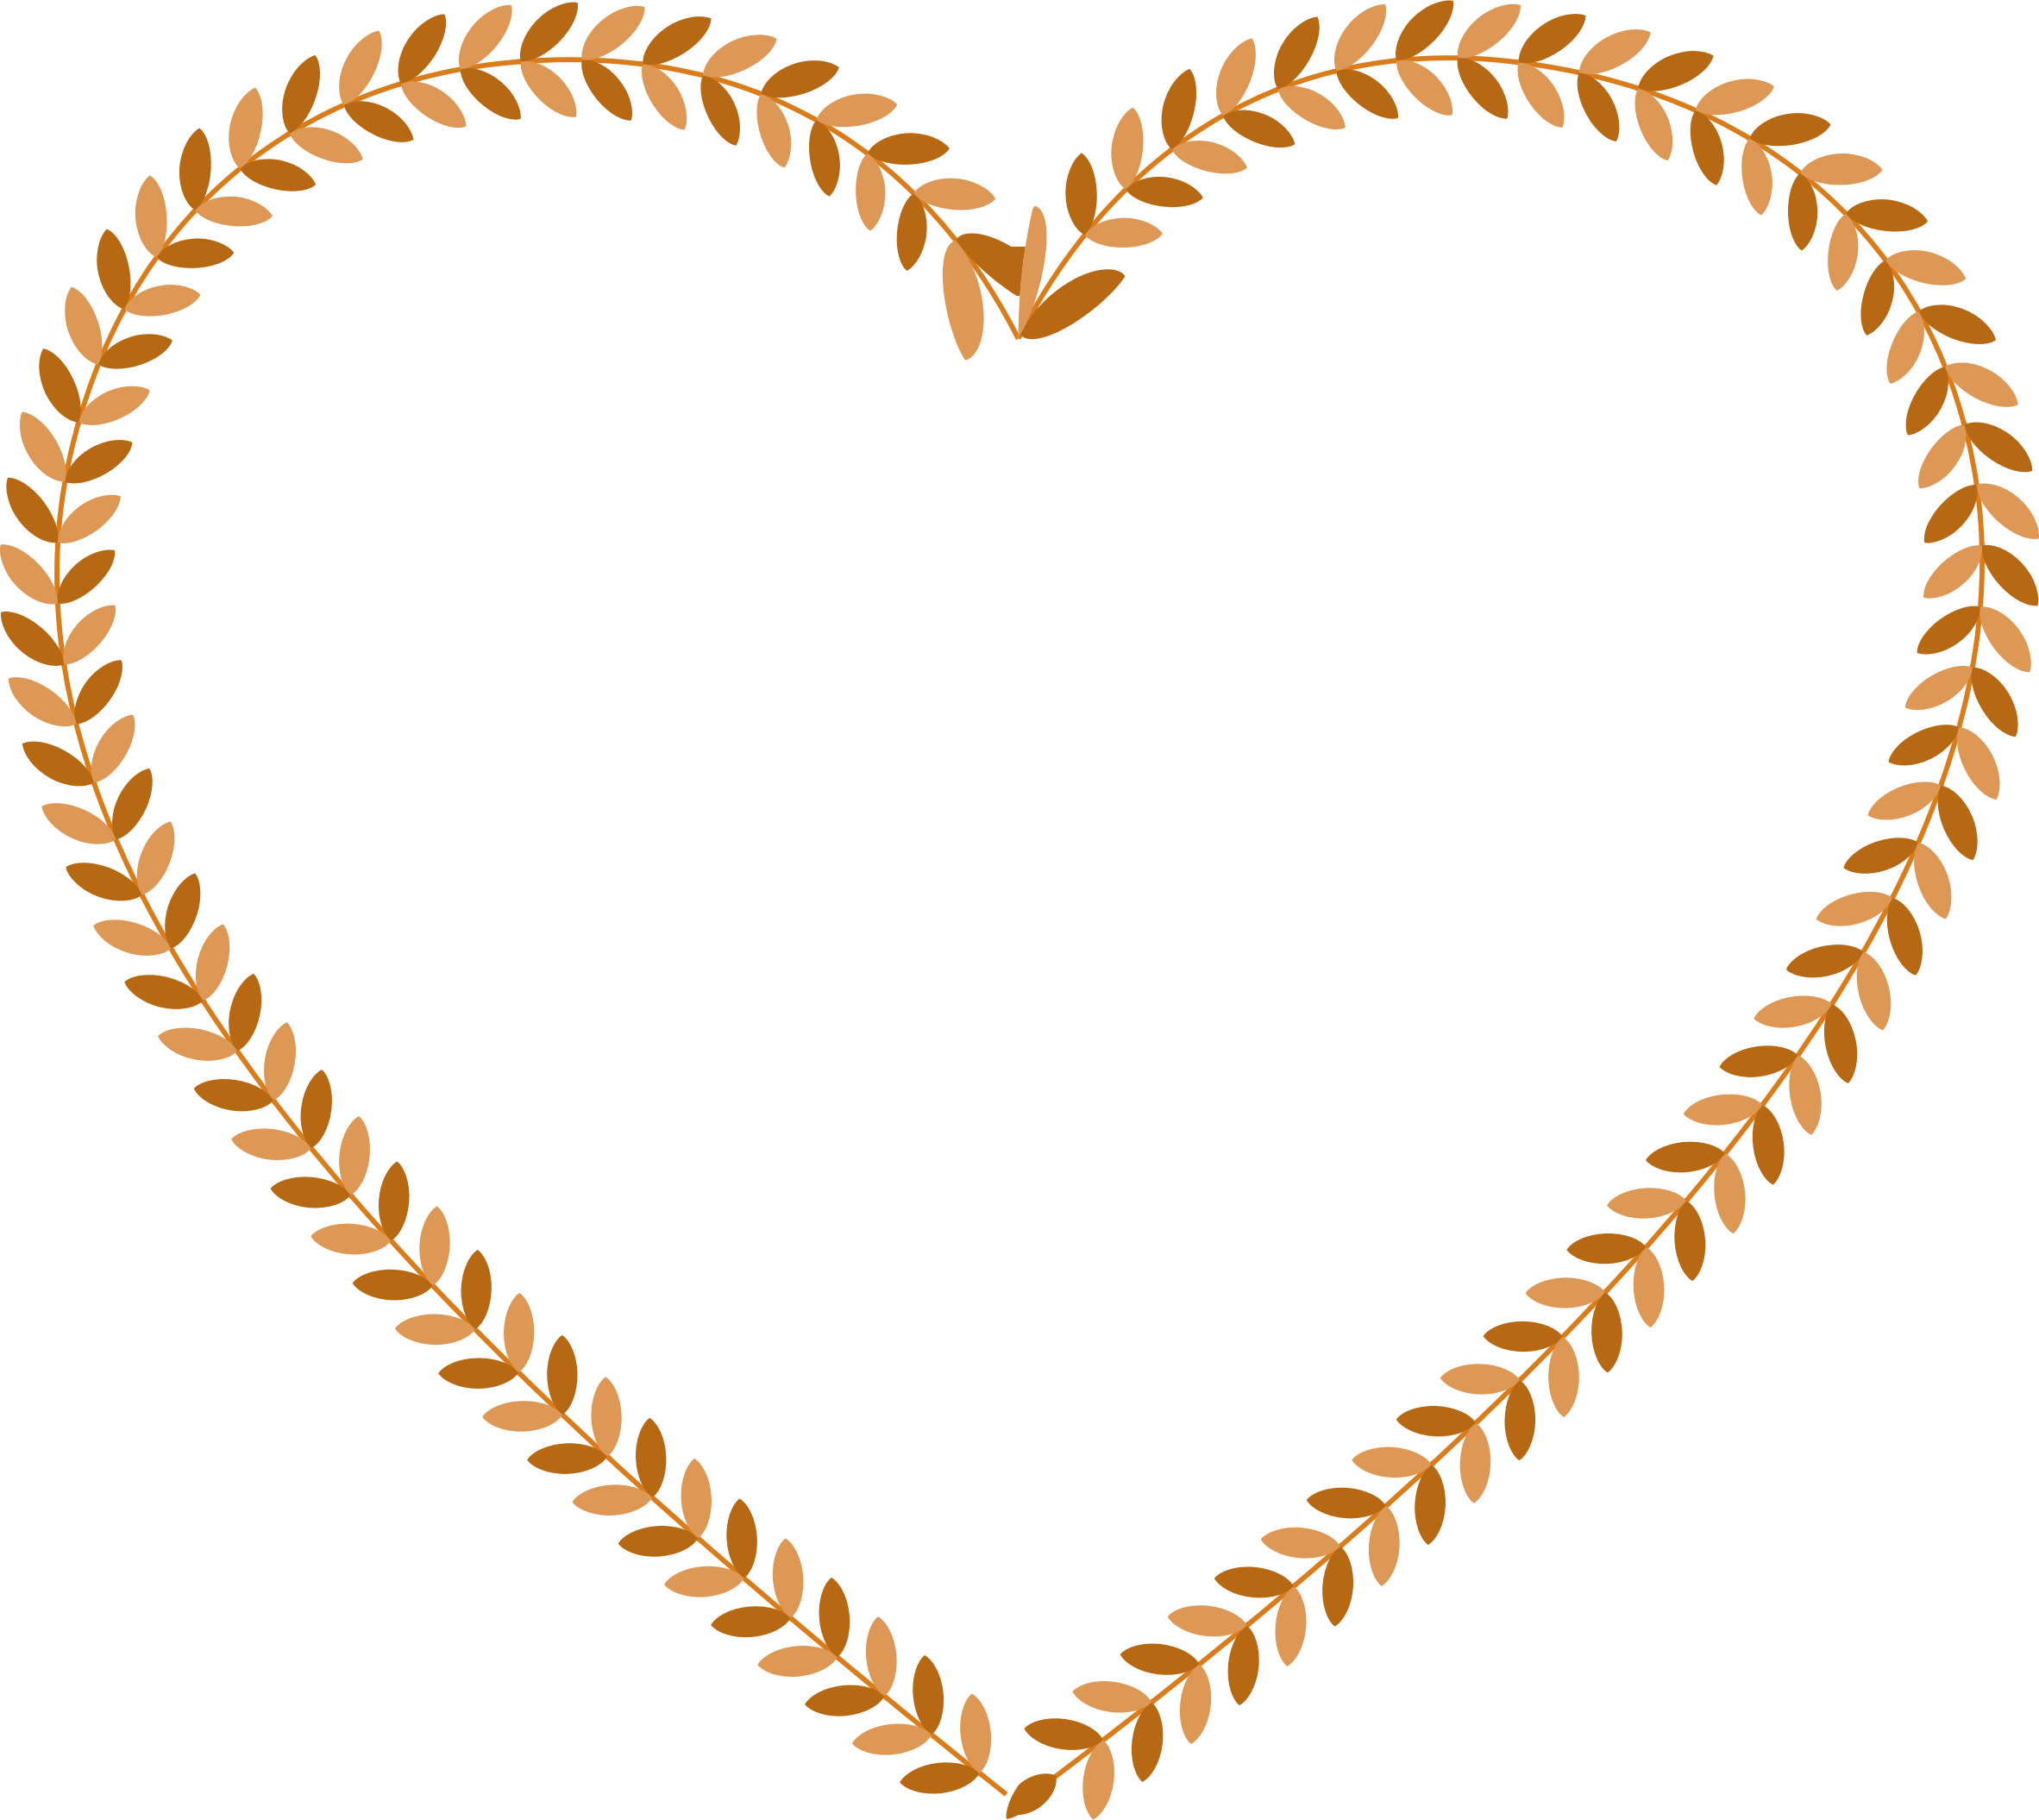 Clipart heart vine. Big image png